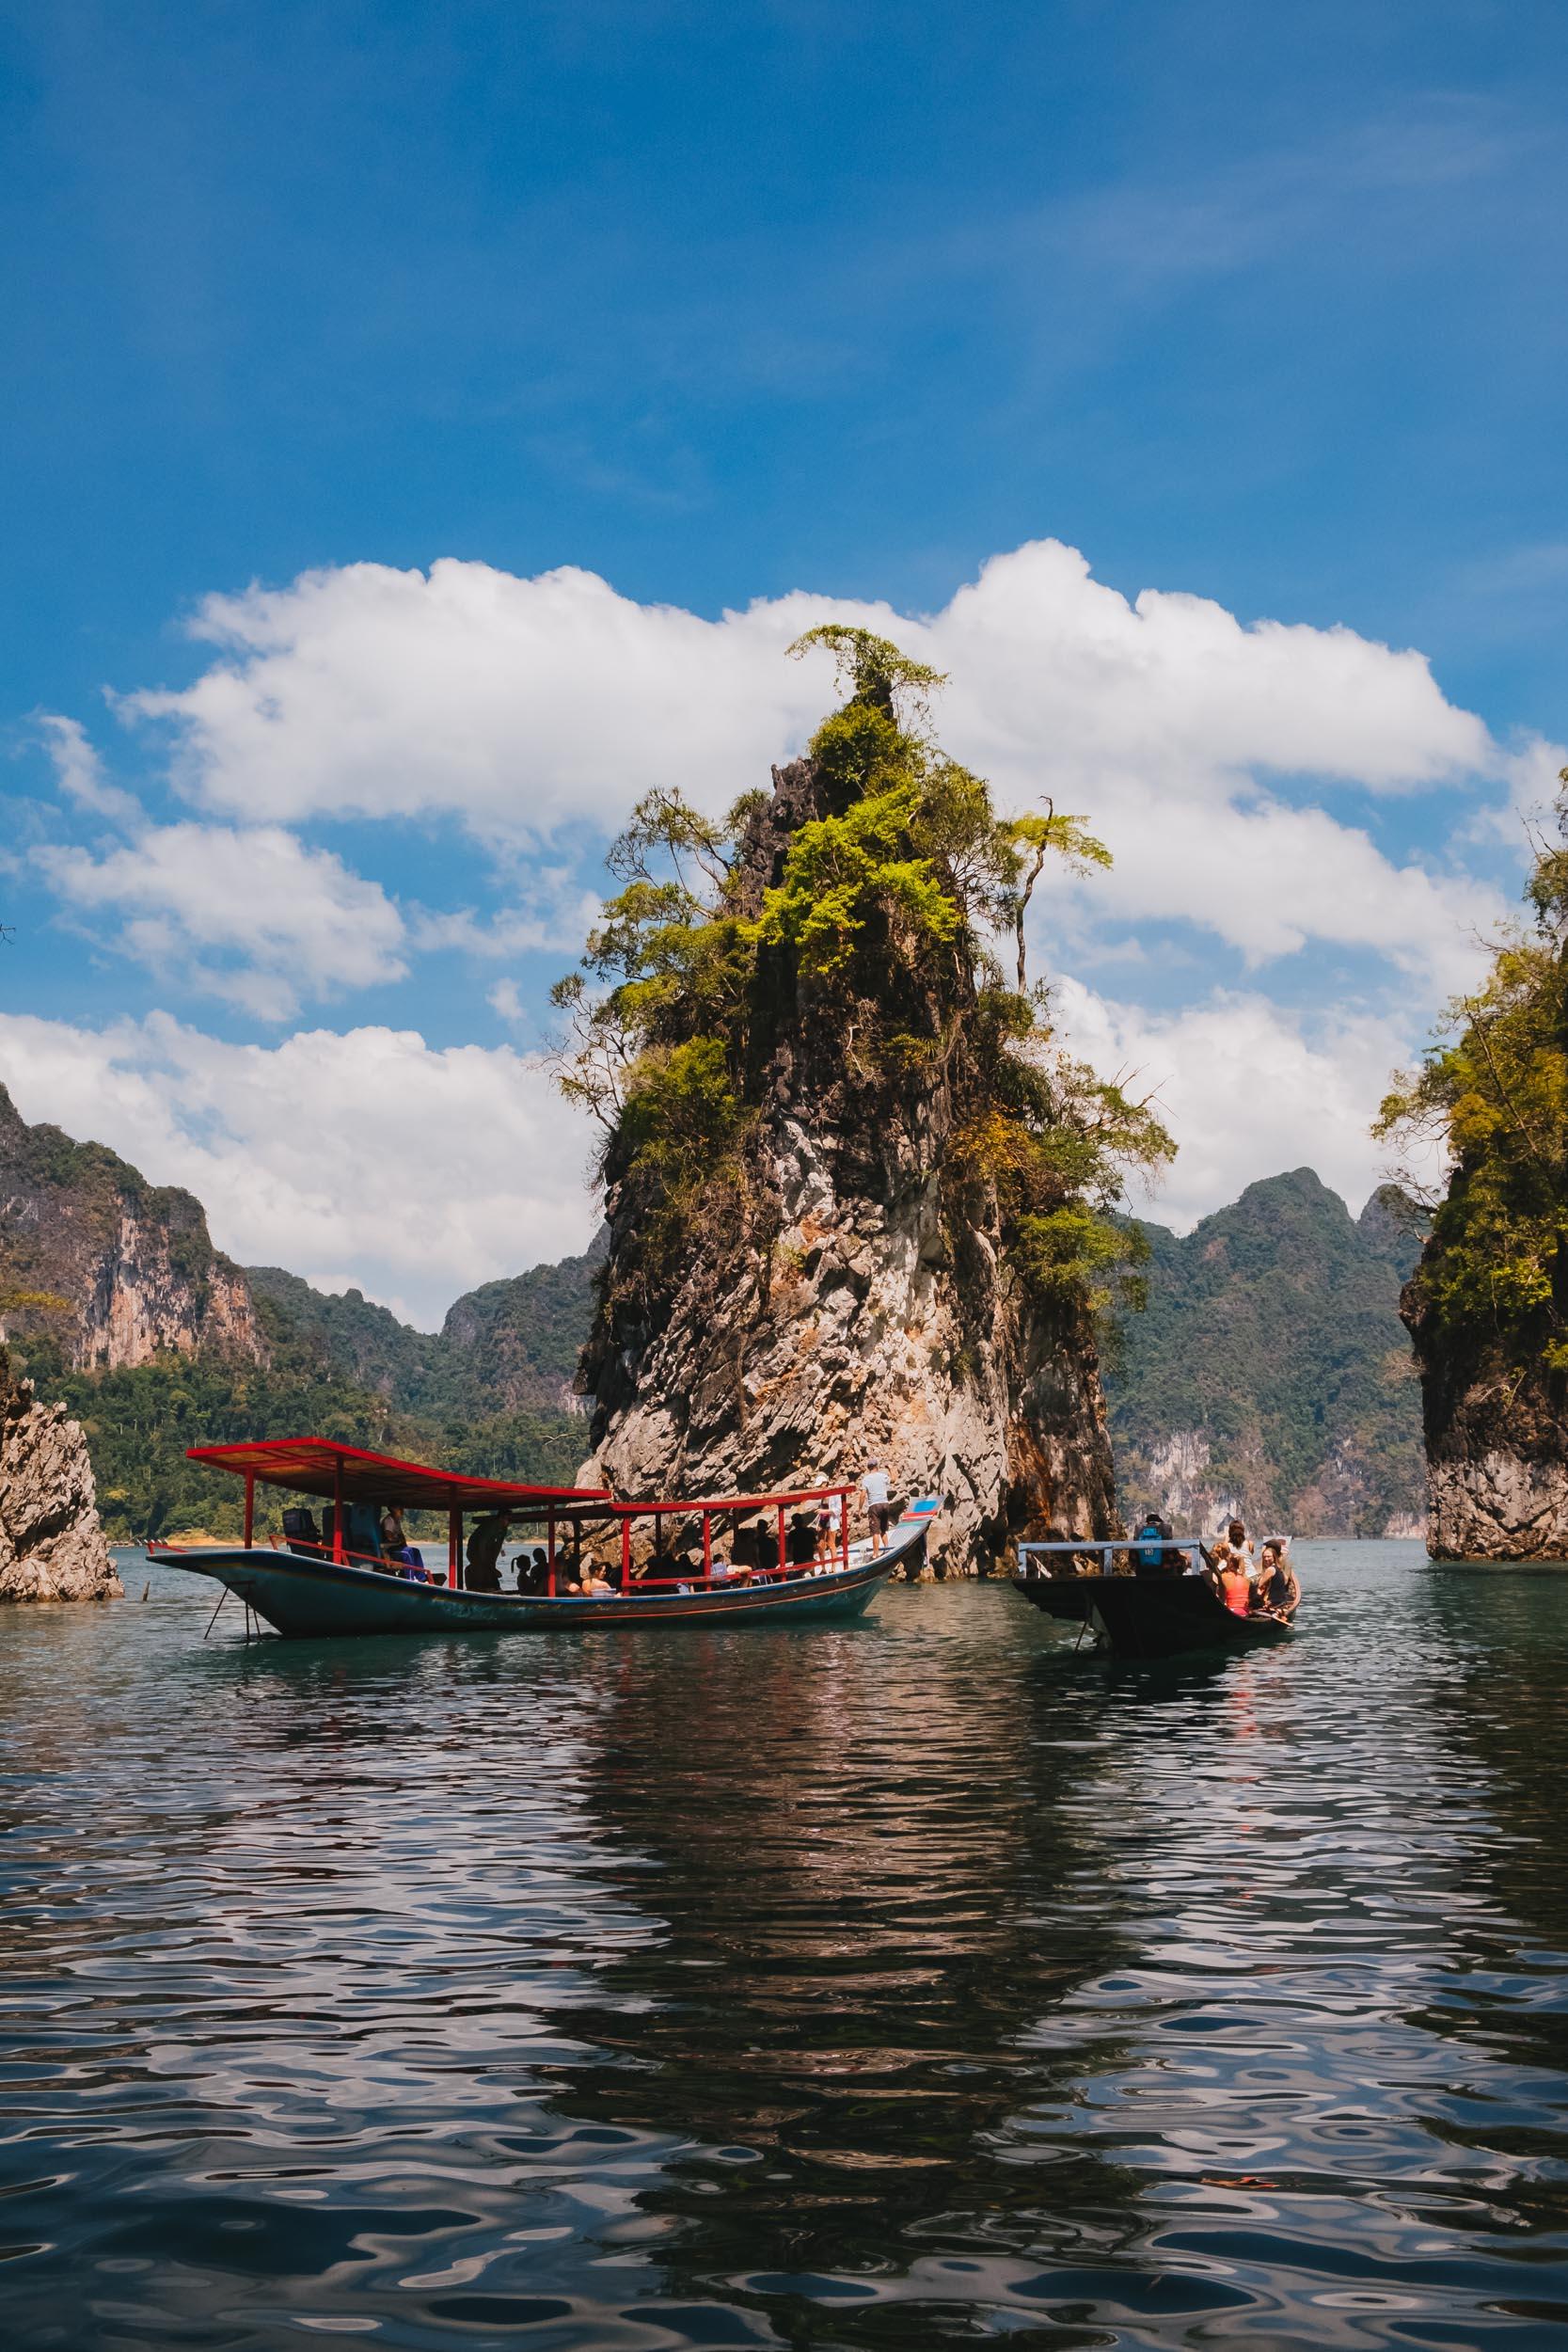 Thailand-20180306-002656.jpg